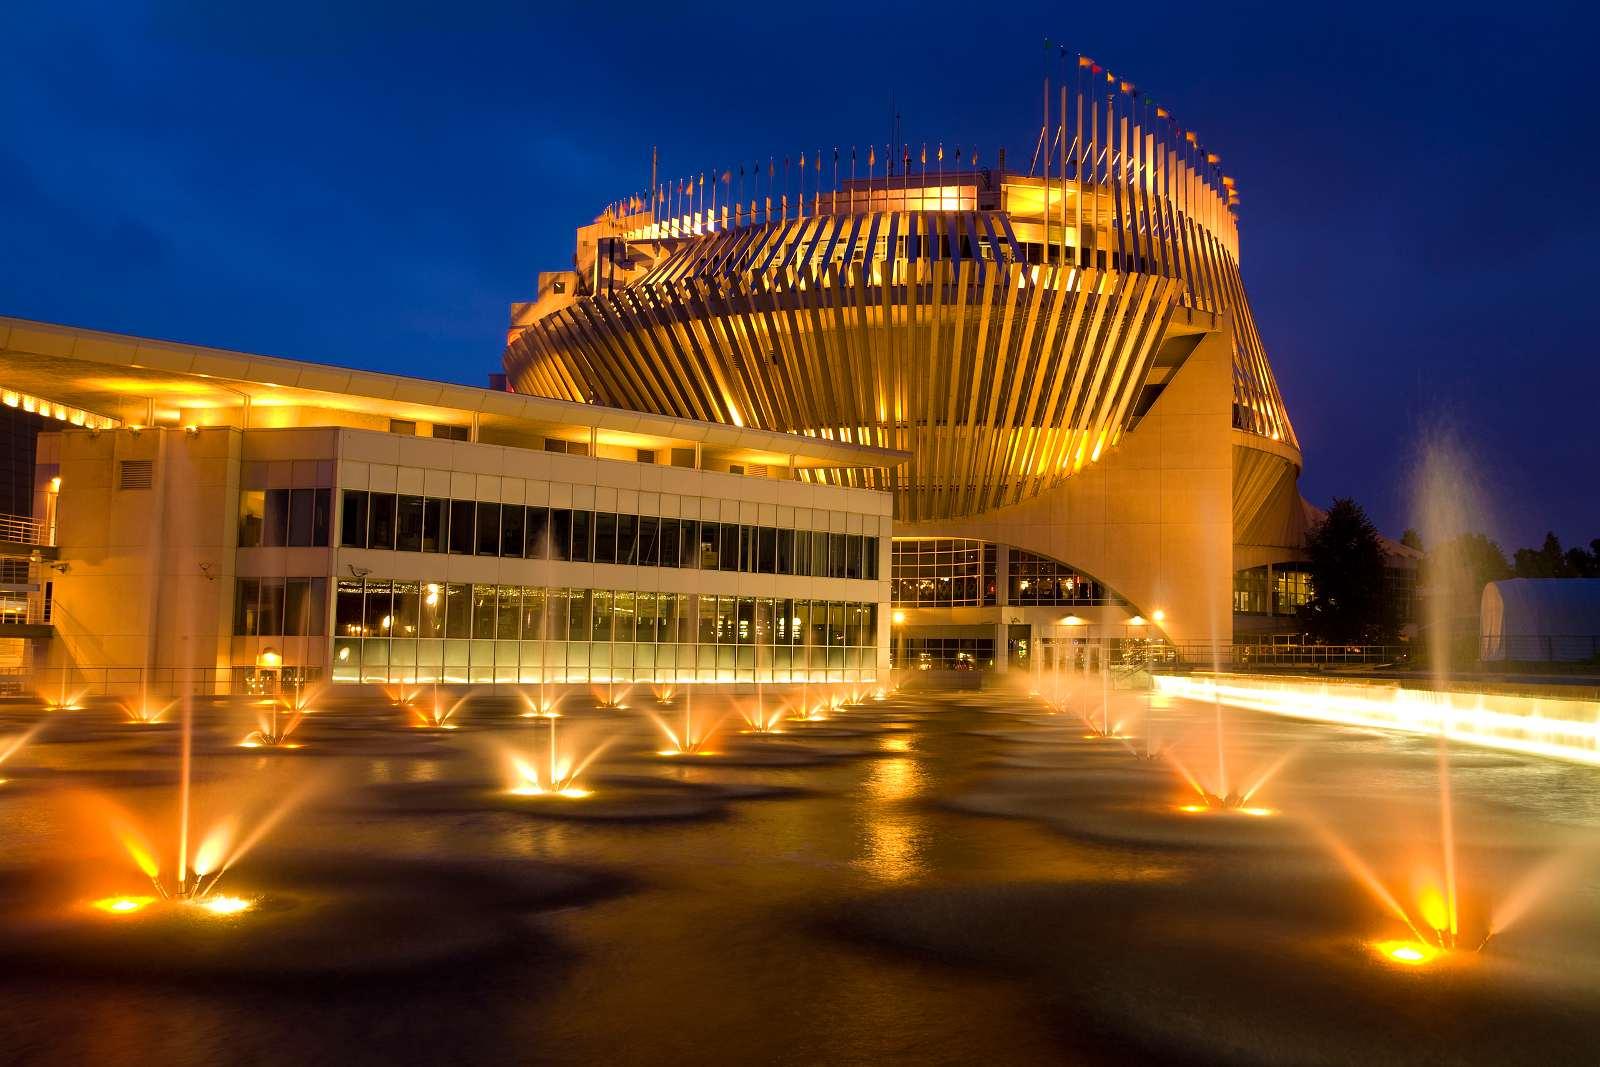 Montreal Casino at night.